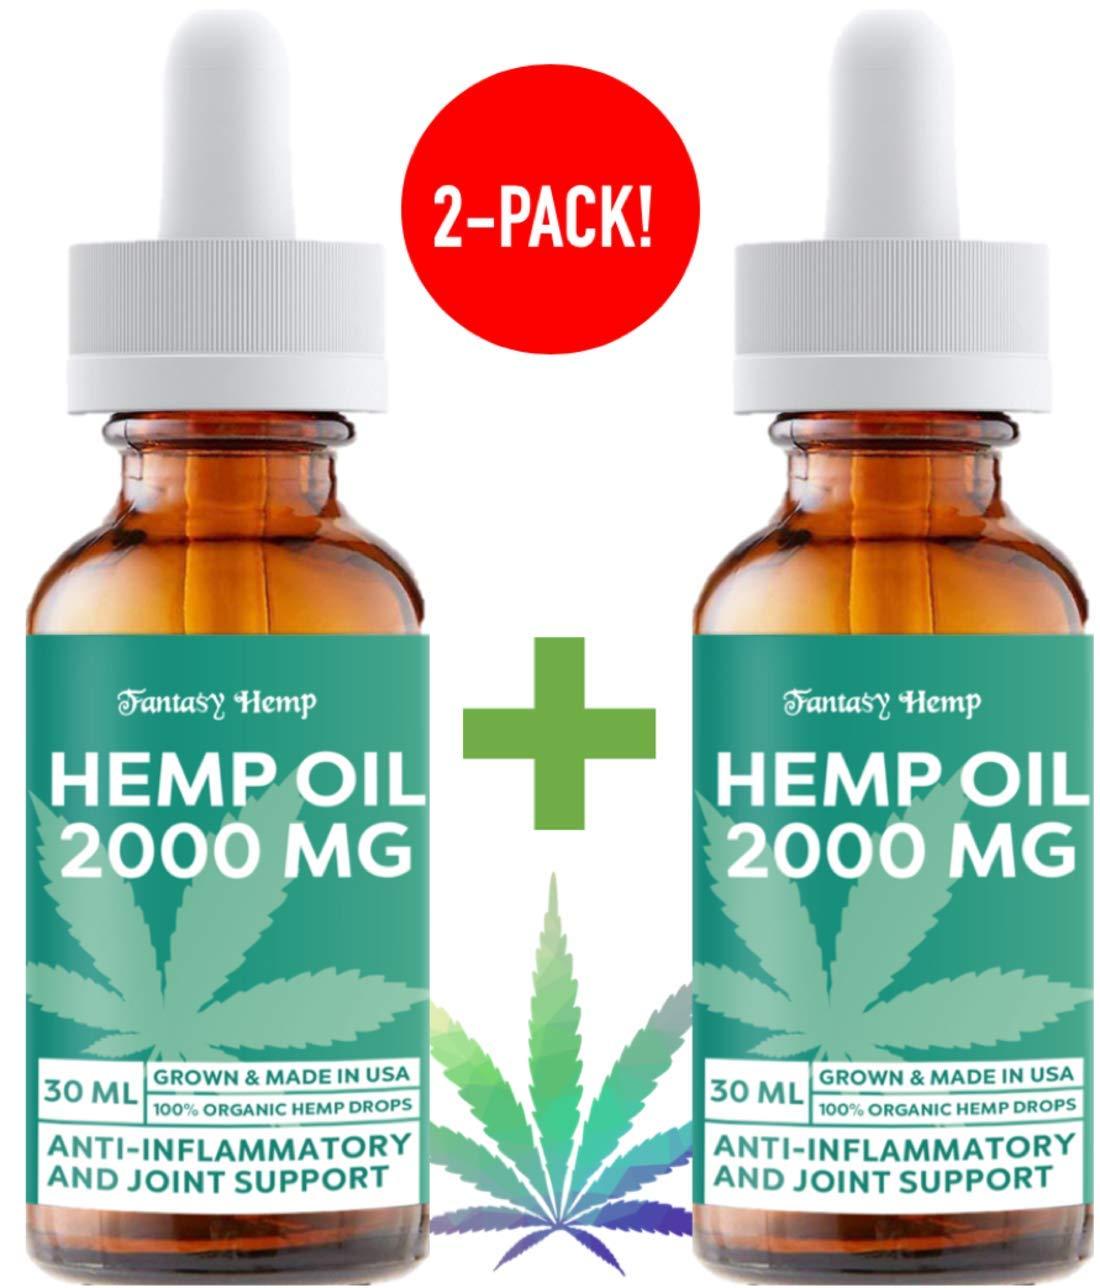 (2 Pack) Hemp Oil 2000mg : Hemp Oil for Pain Stress Relief, Mood Support, Healthy Sleep Patterns, Skin Care (2000mg, 67mg per Serving x 30 Servings) : Fantasy Hemp by Fantasy Hemp